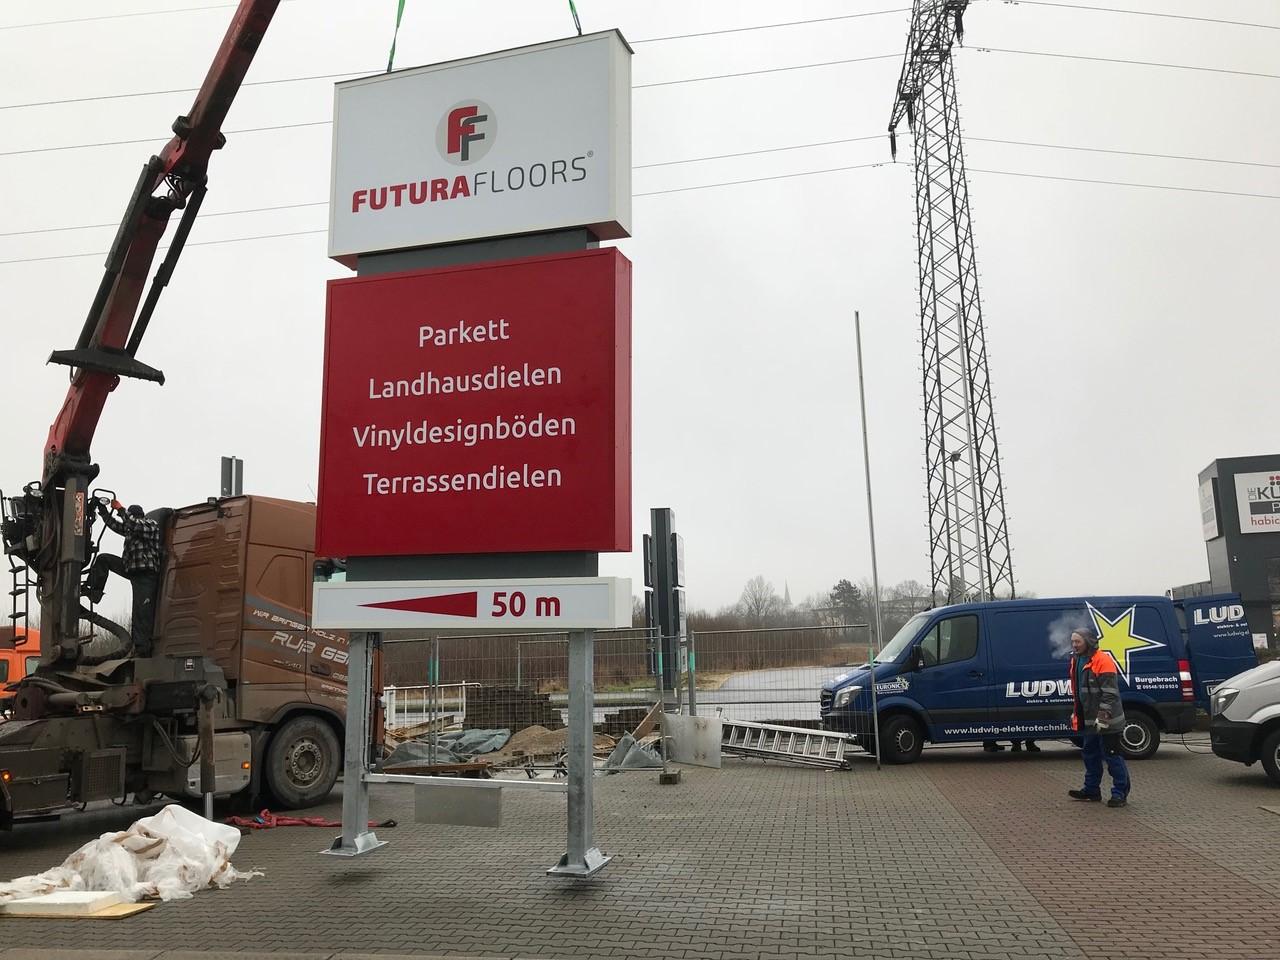 Montage - Werbeturm - Futura Floors - Werbepylon.de